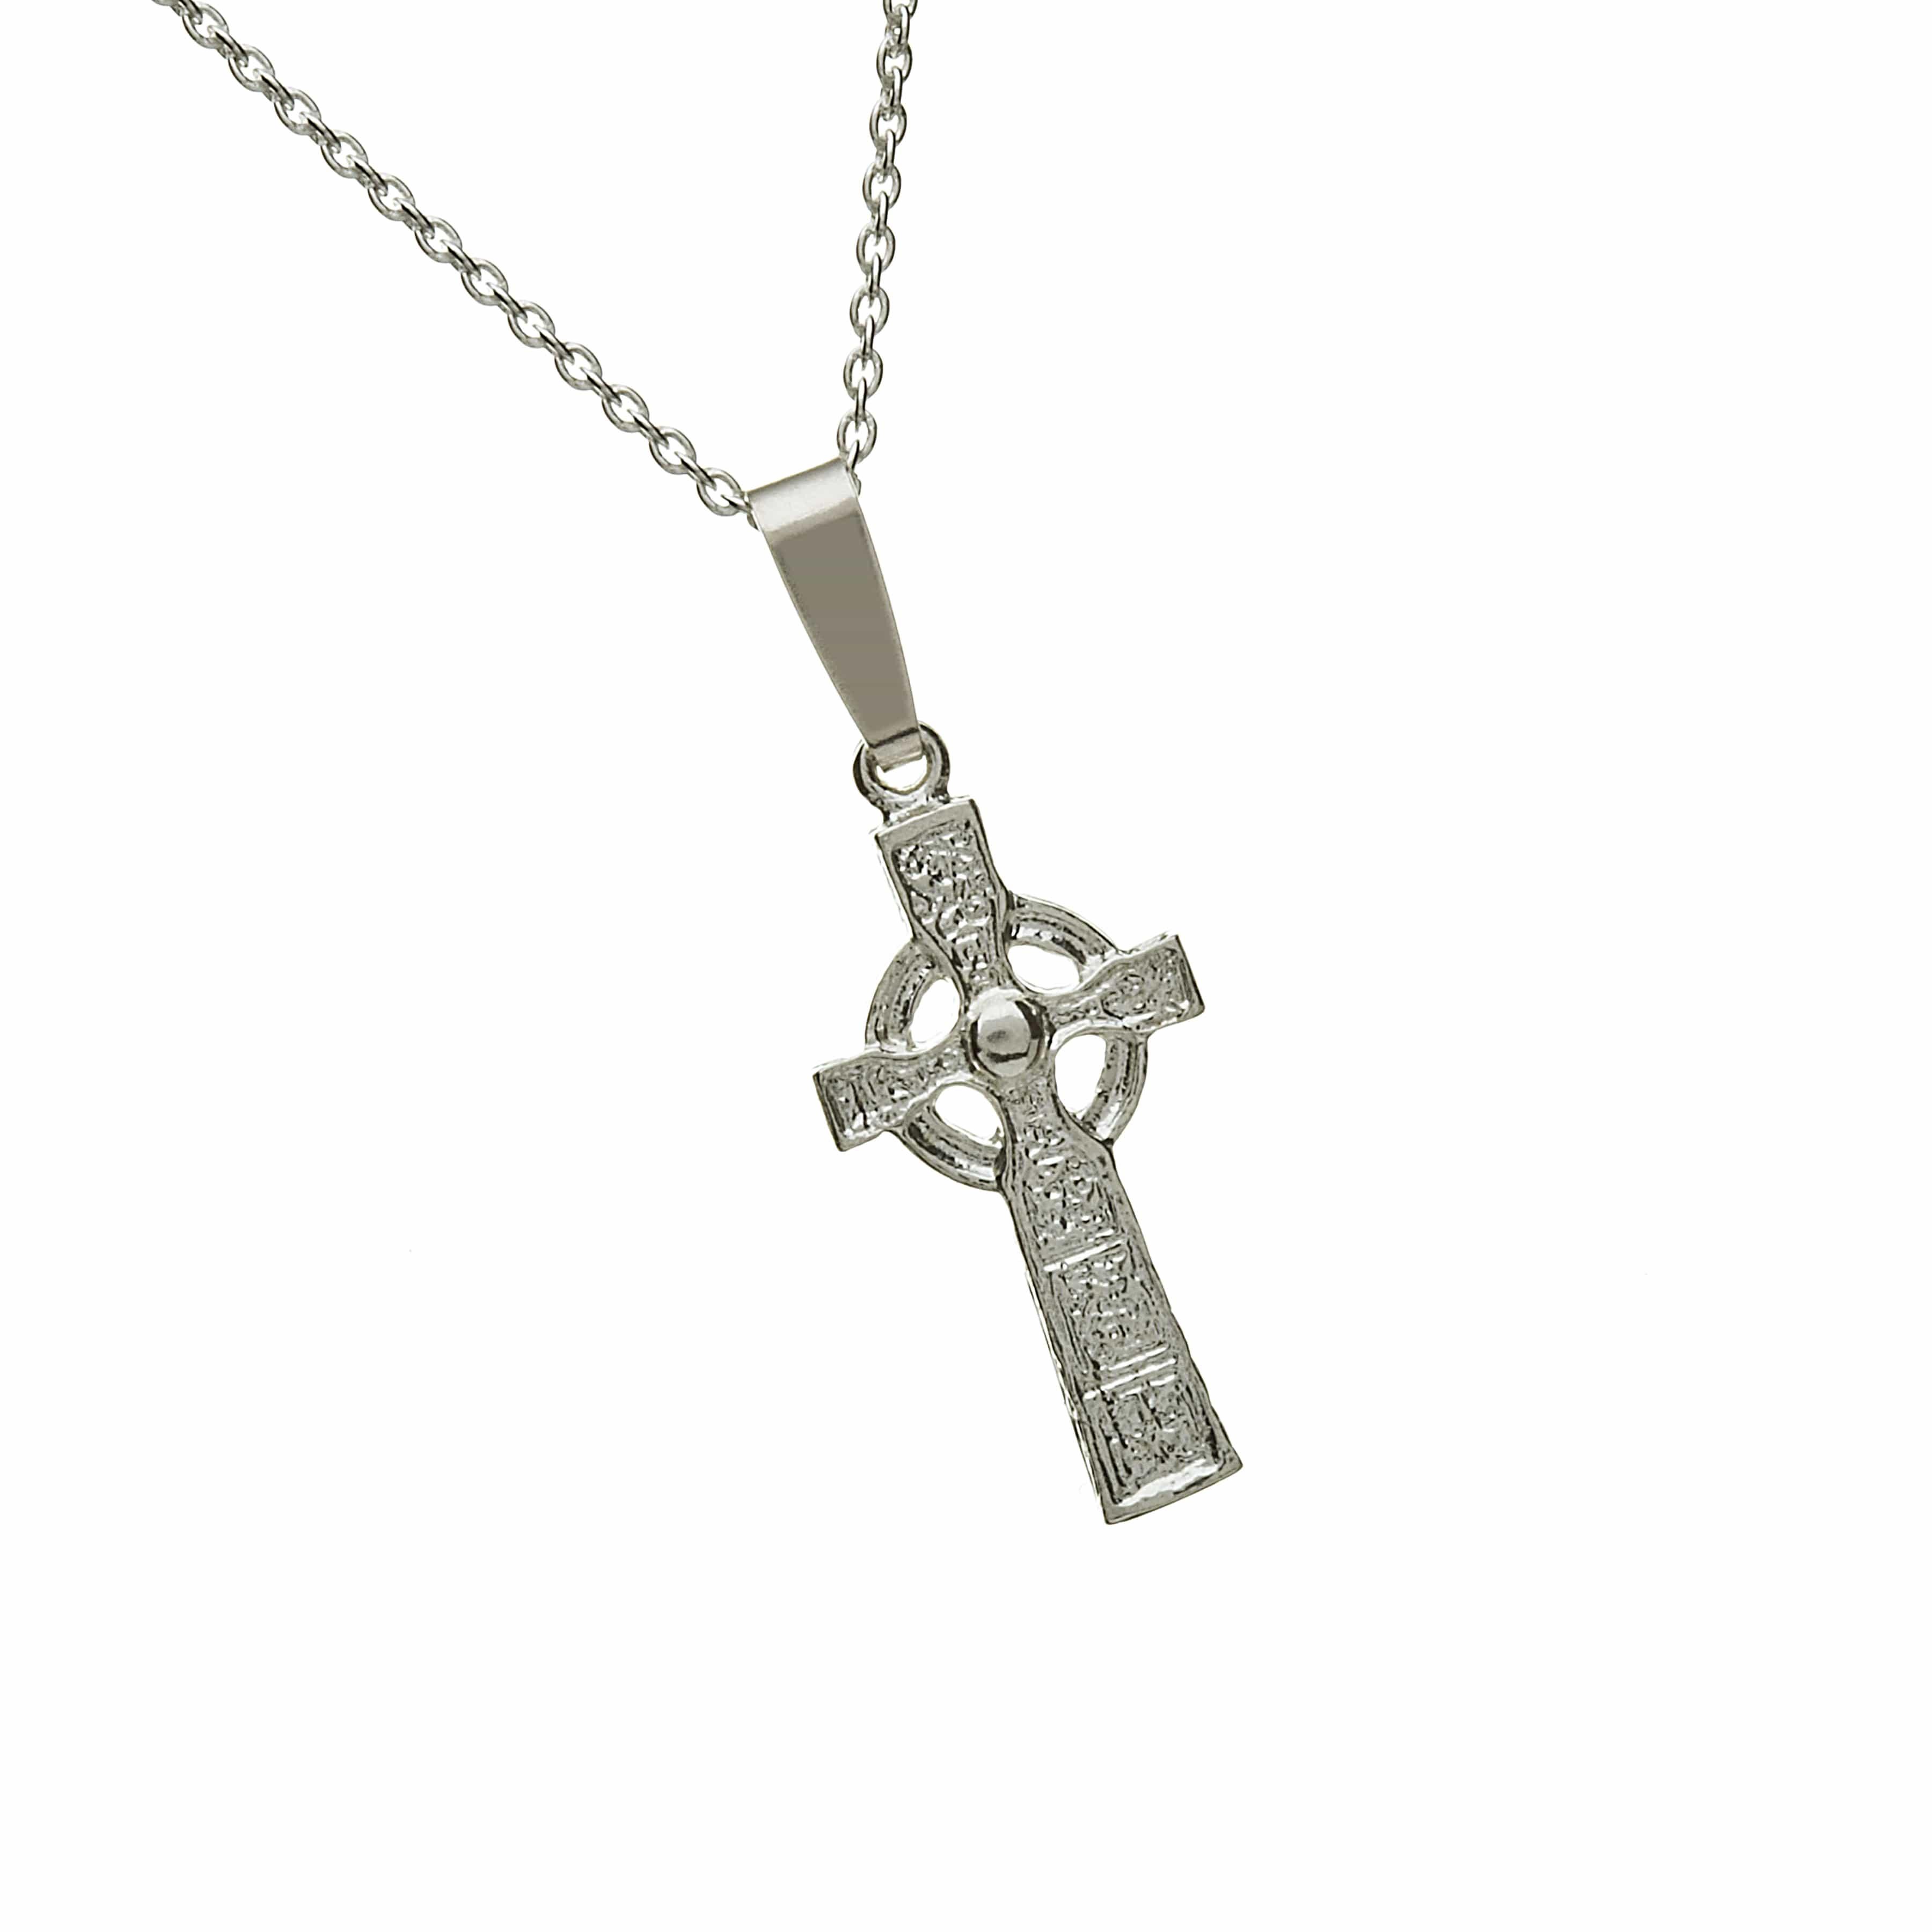 Small Carandonagh Cross